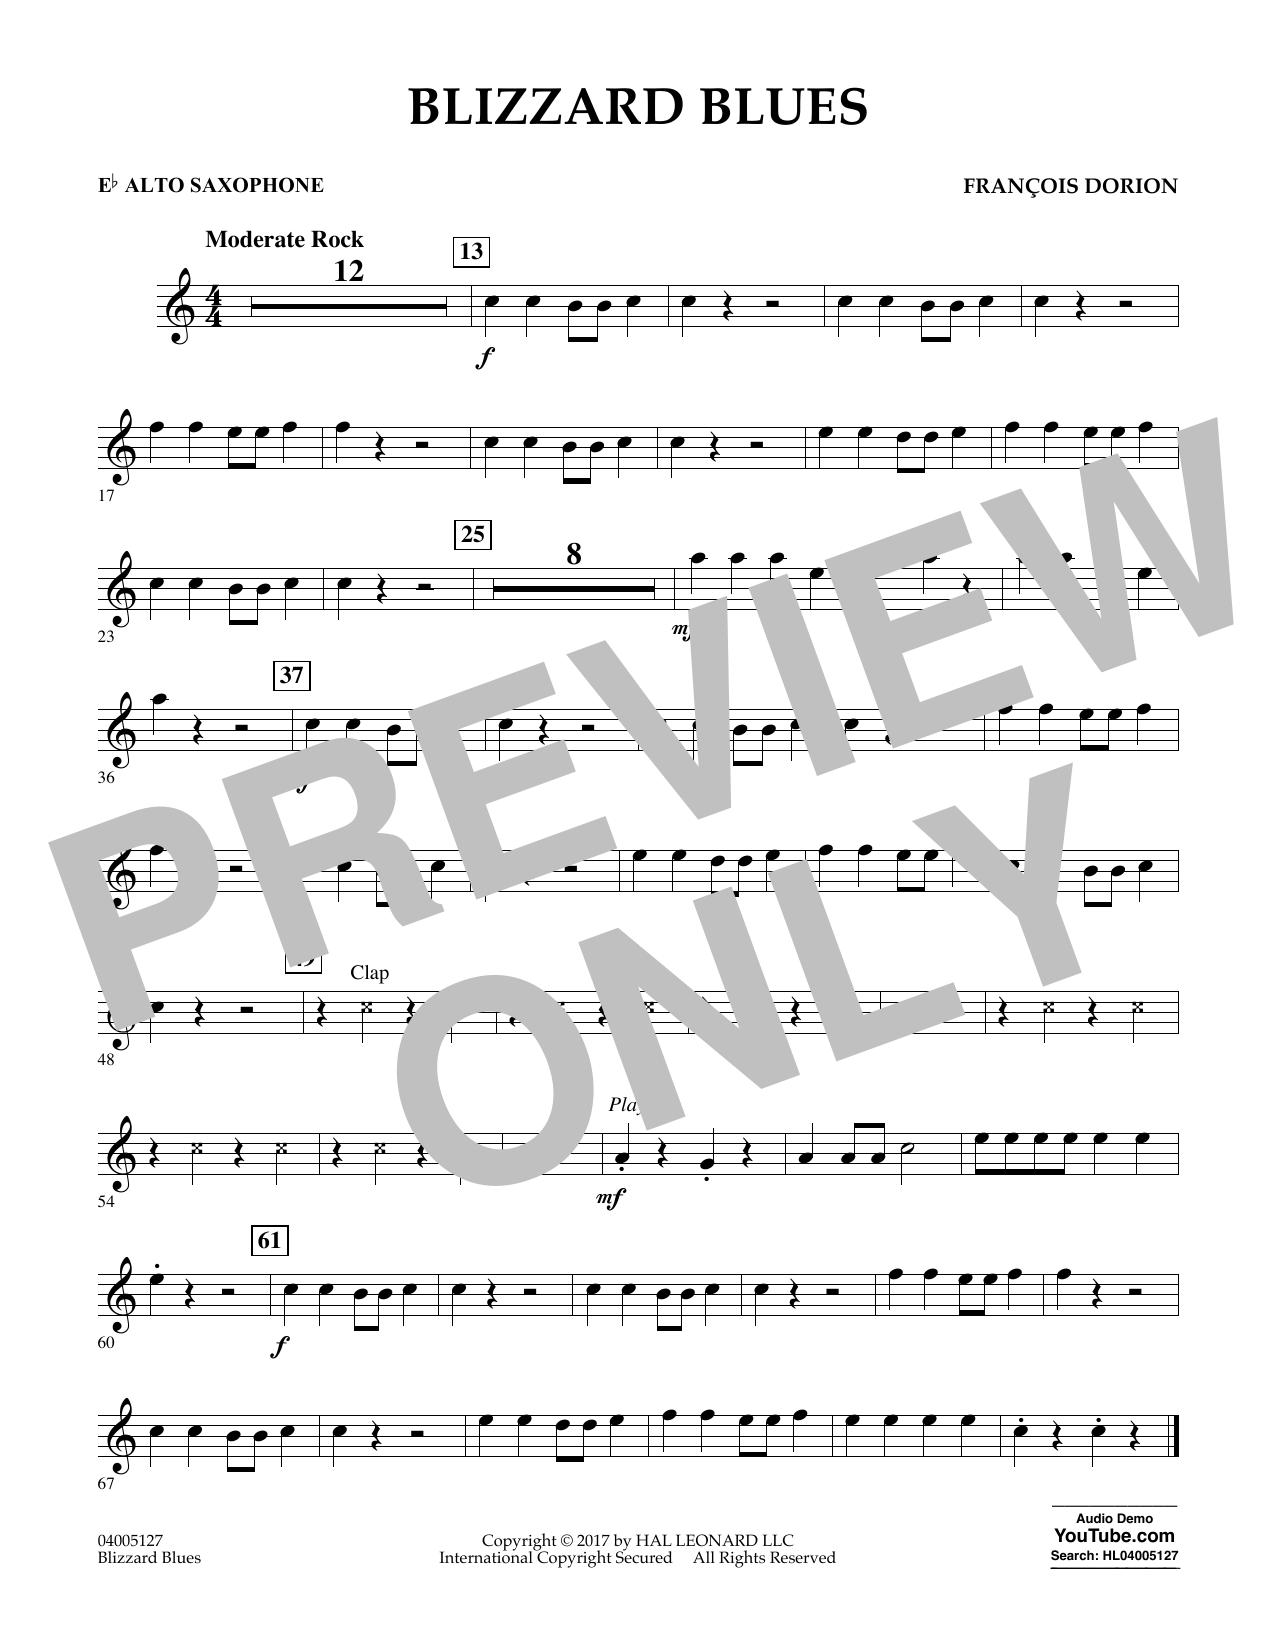 Francois Dorion Blizzard Blues - Eb Alto Saxophone sheet music notes and chords. Download Printable PDF.